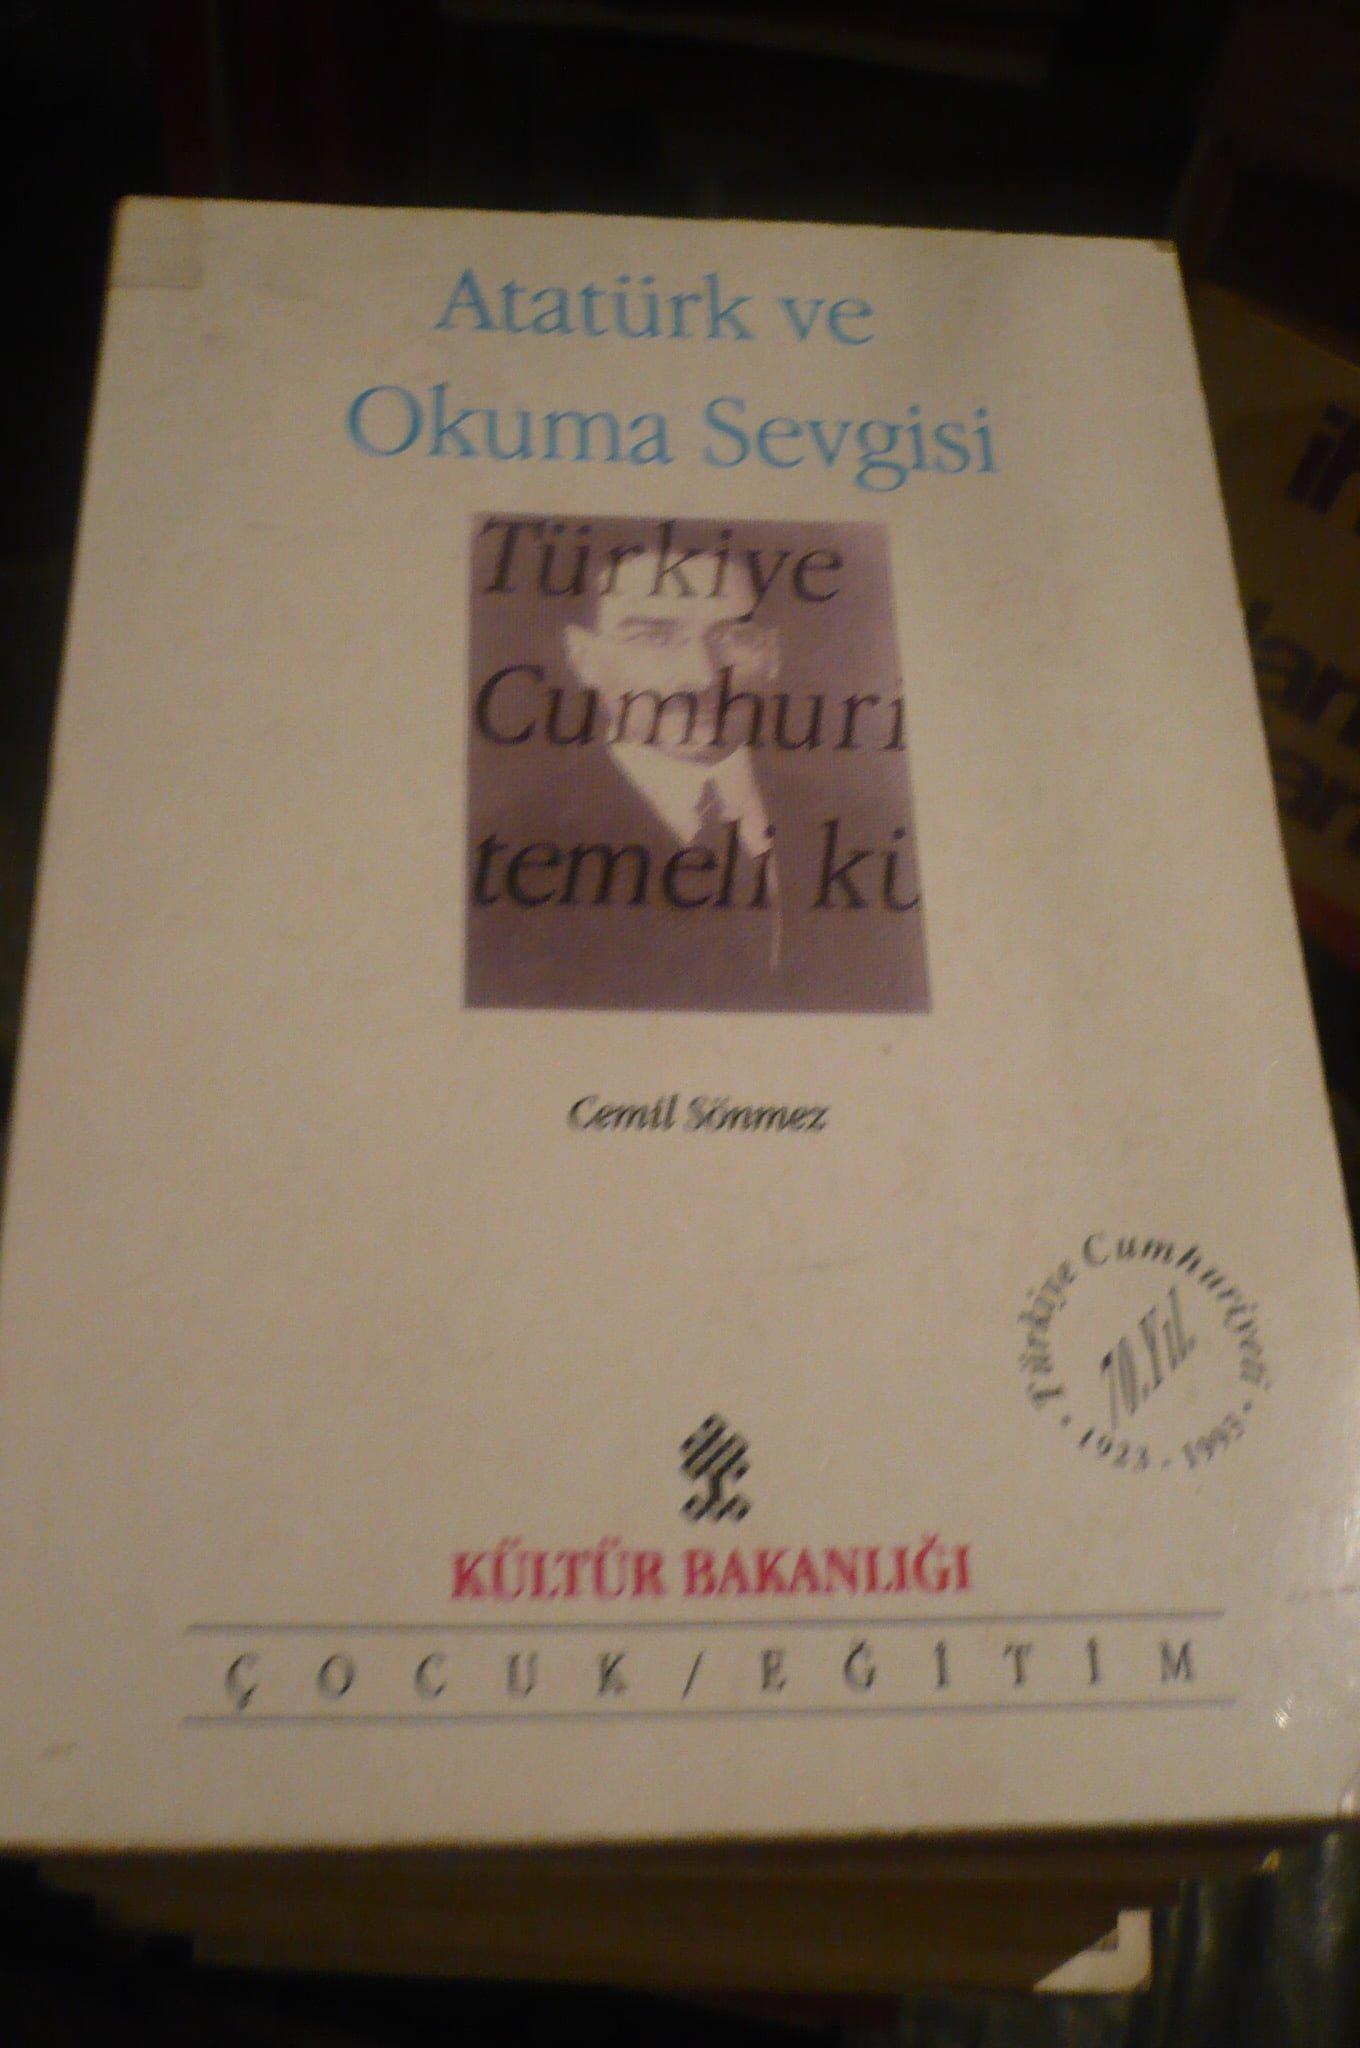 ATATÜRK VE OKUMA SEVGİSİ/Cemil SÖNMEZ/10 TL